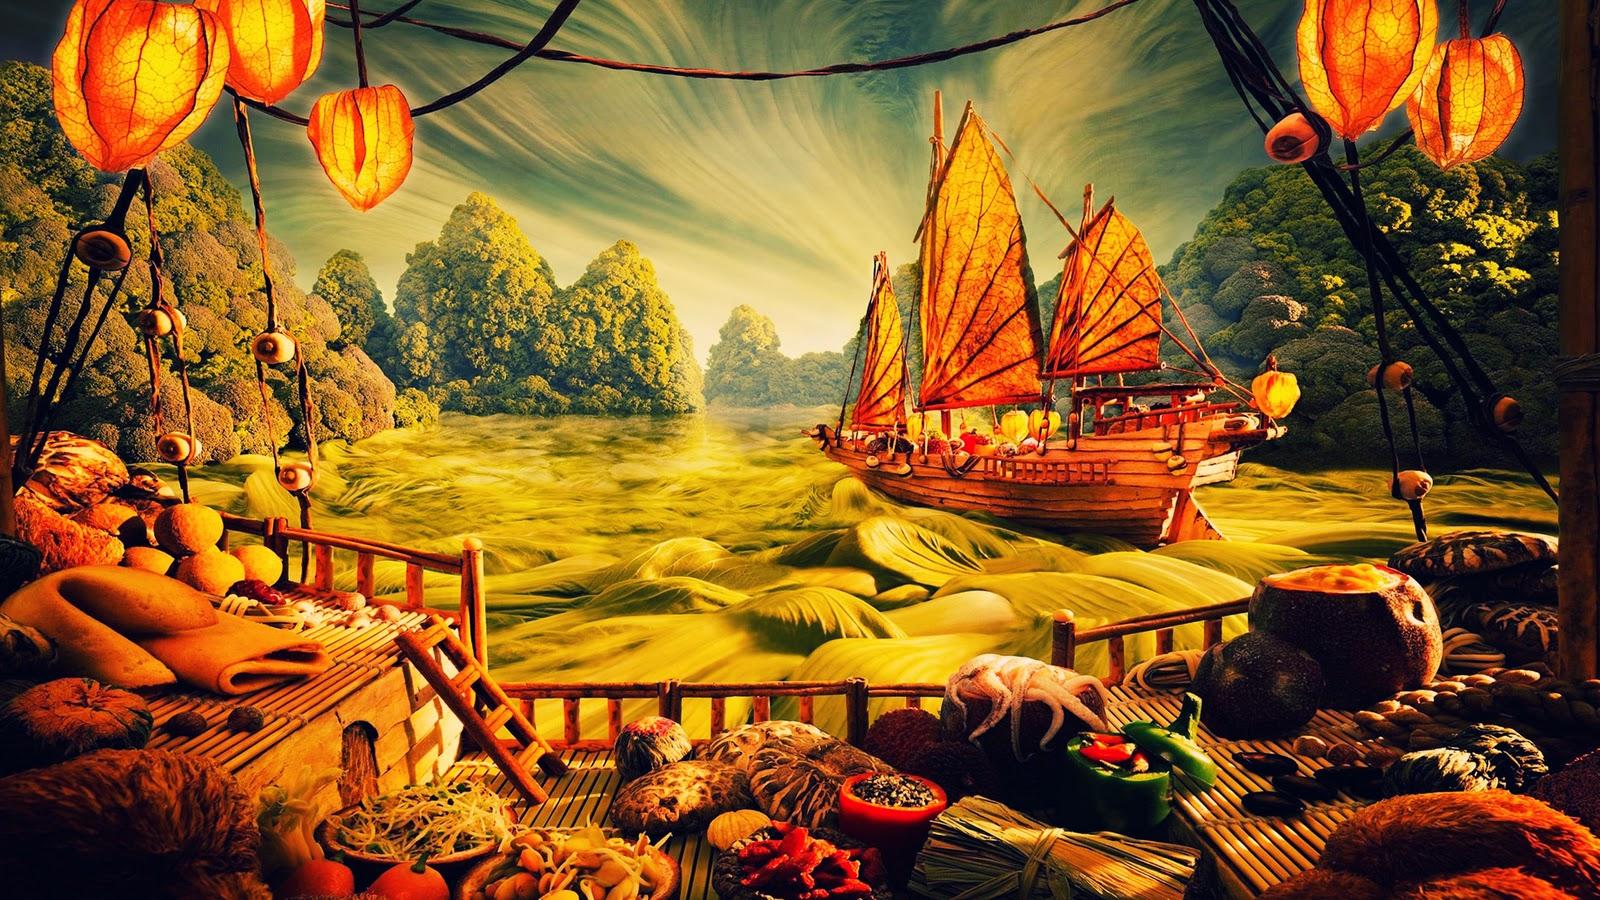 Animated Wallpapers for Windows XP - WallpaperSafari - photo#38